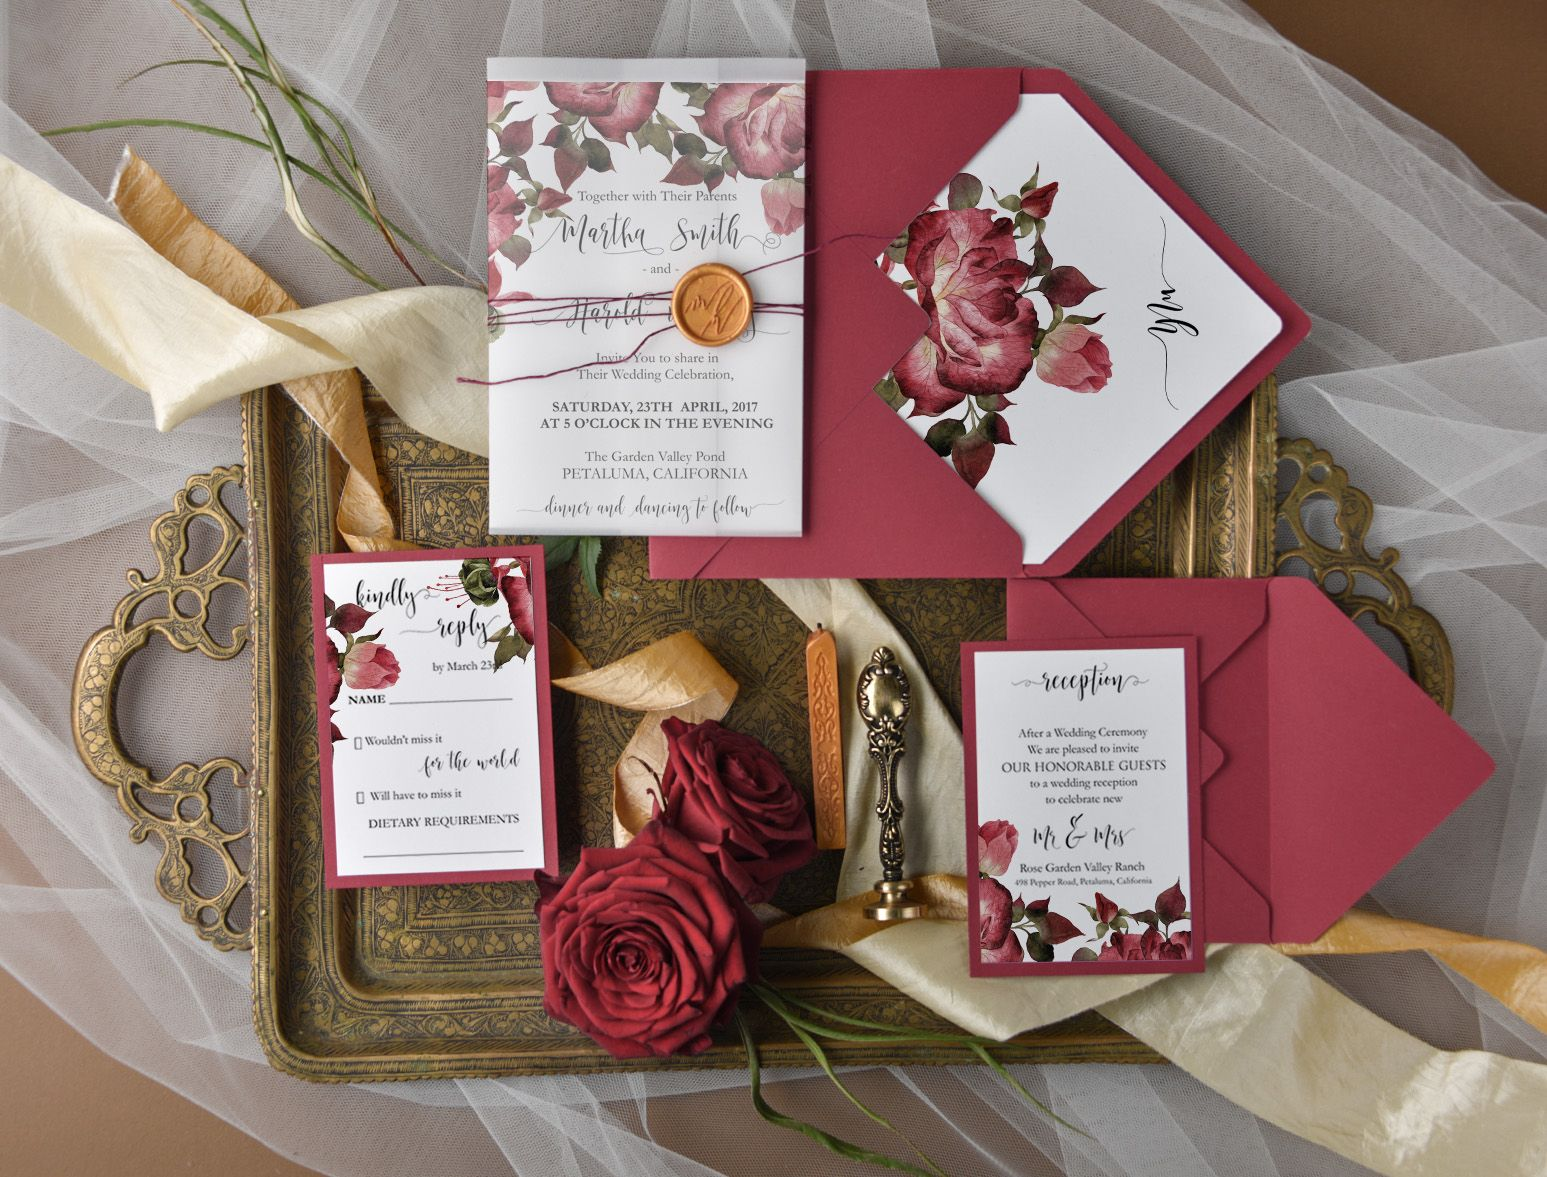 WEDDING INVITATIONS watercolor | Pinterest | Weddings, Invitation ...